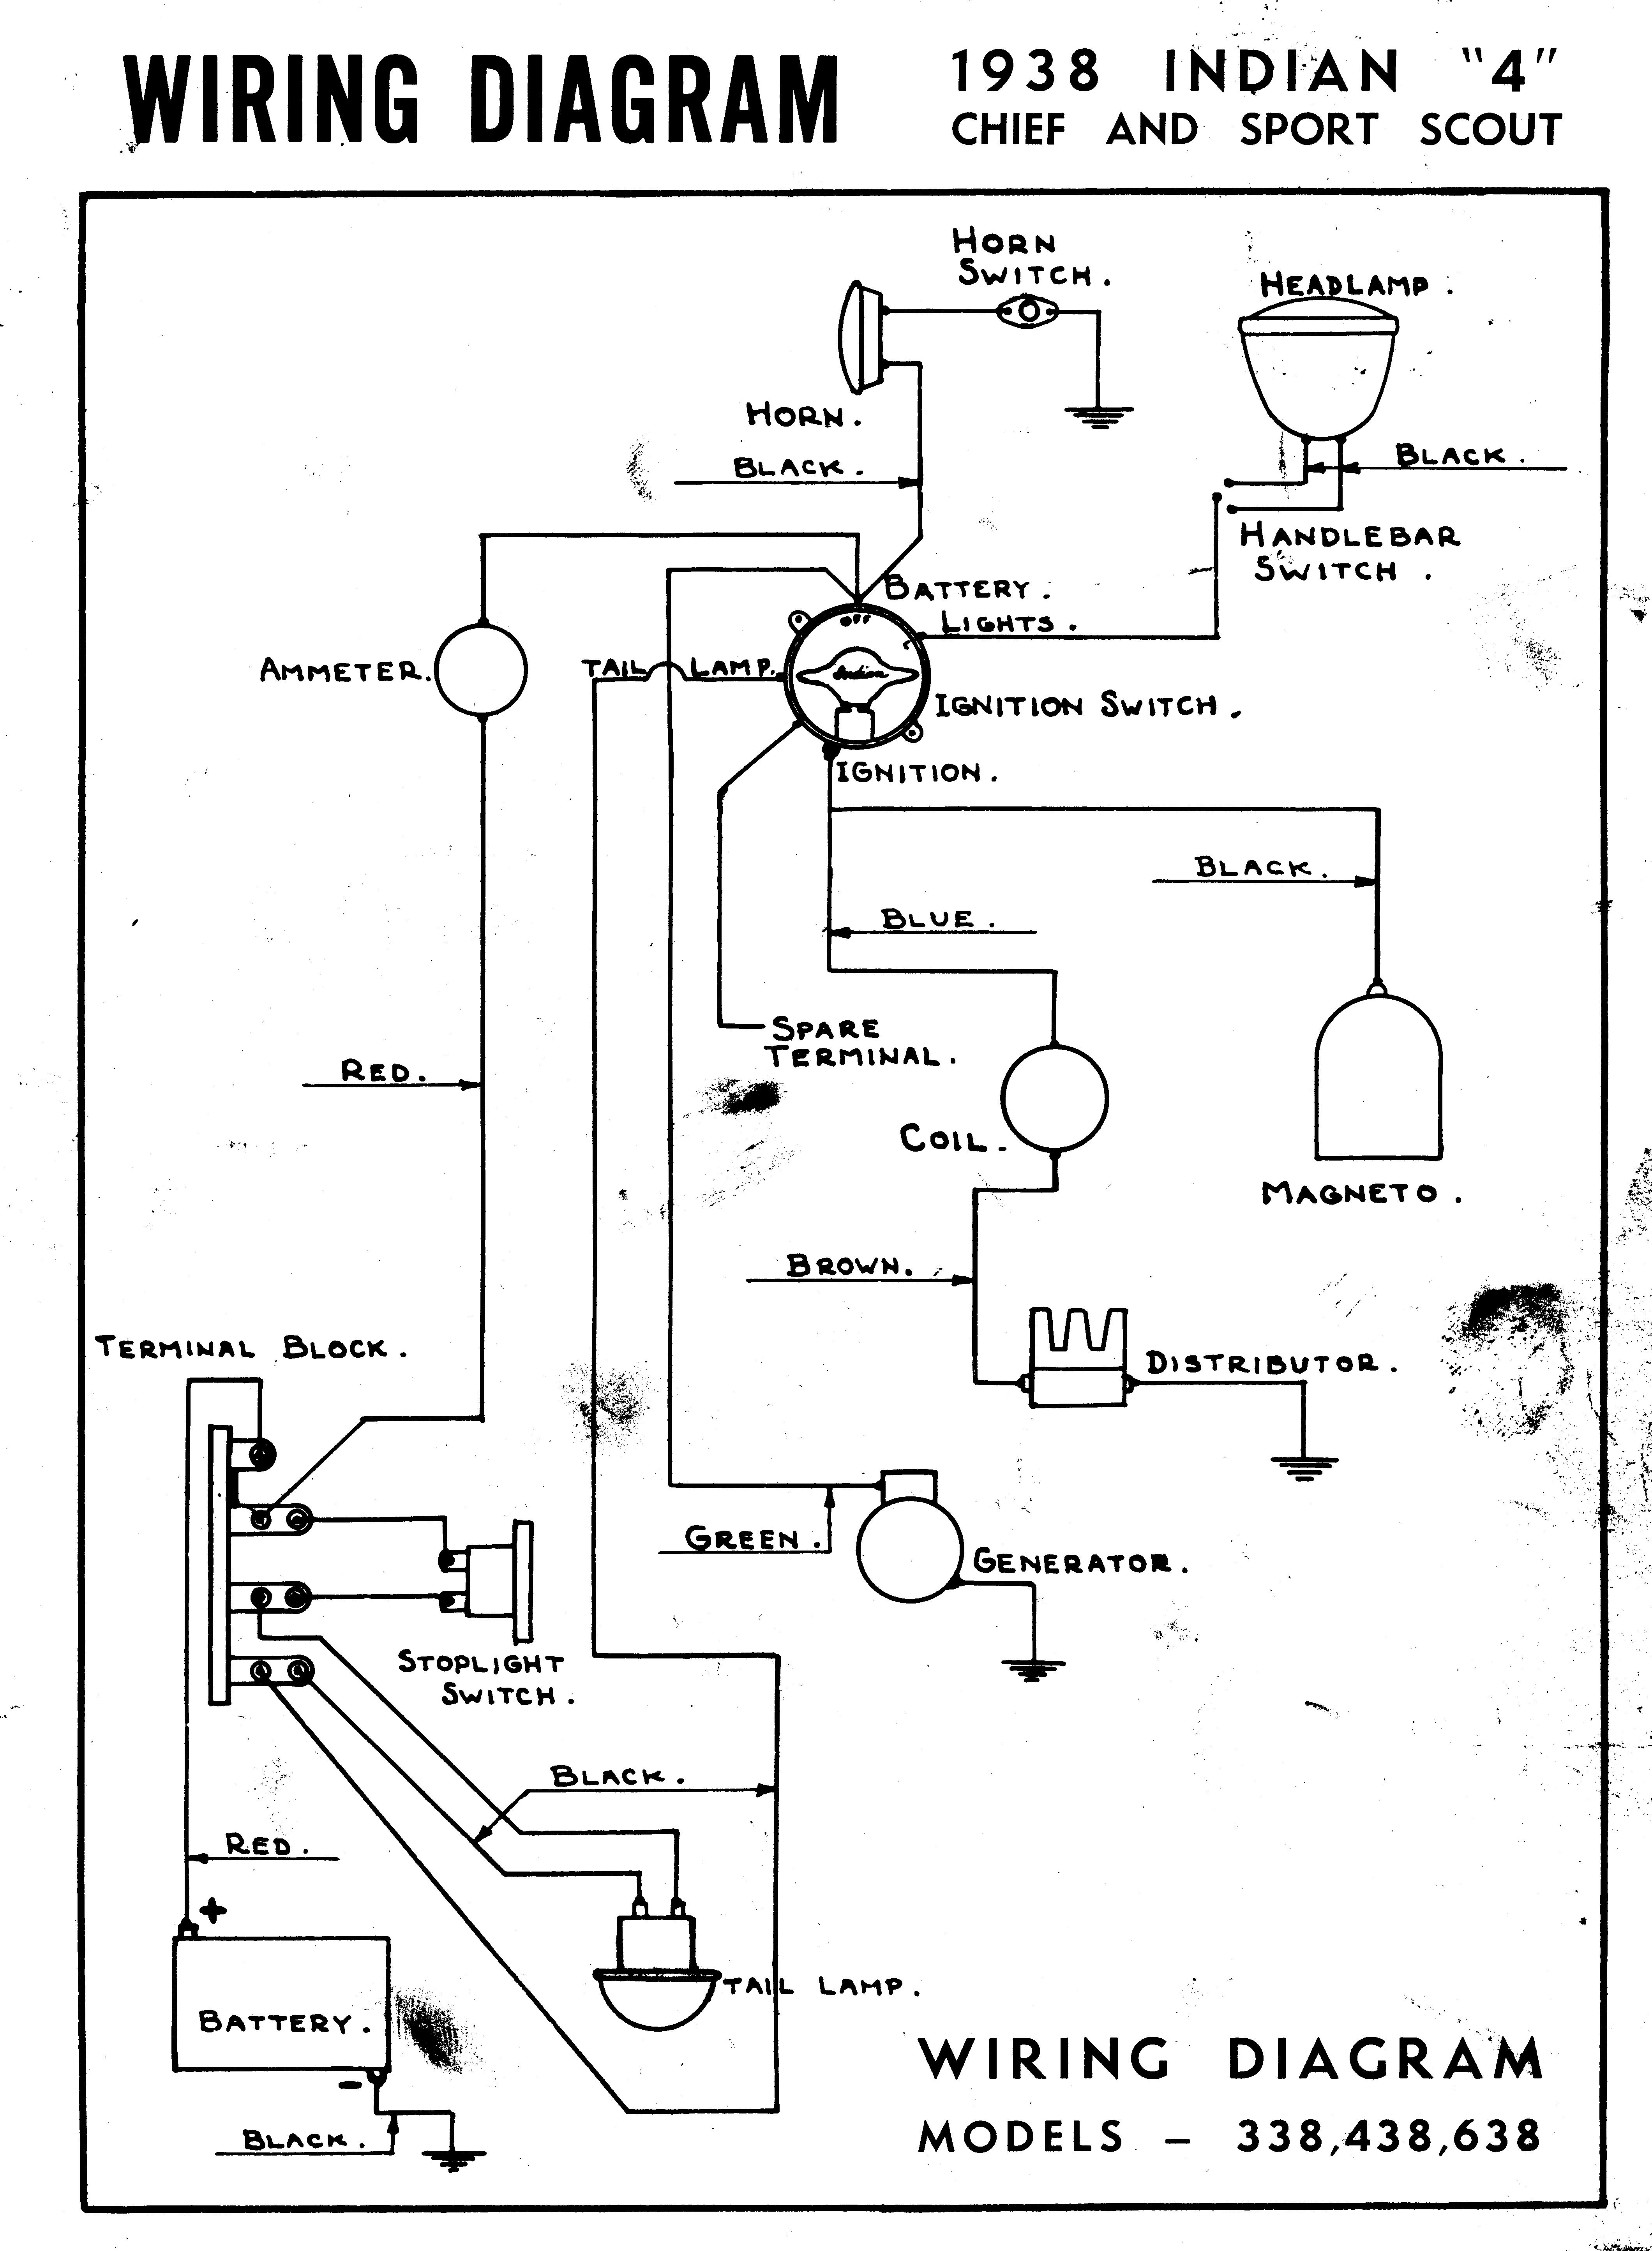 1938 wire diagram - chief - scout - four - starklite indian motorcycles  starklite indian motorcycles